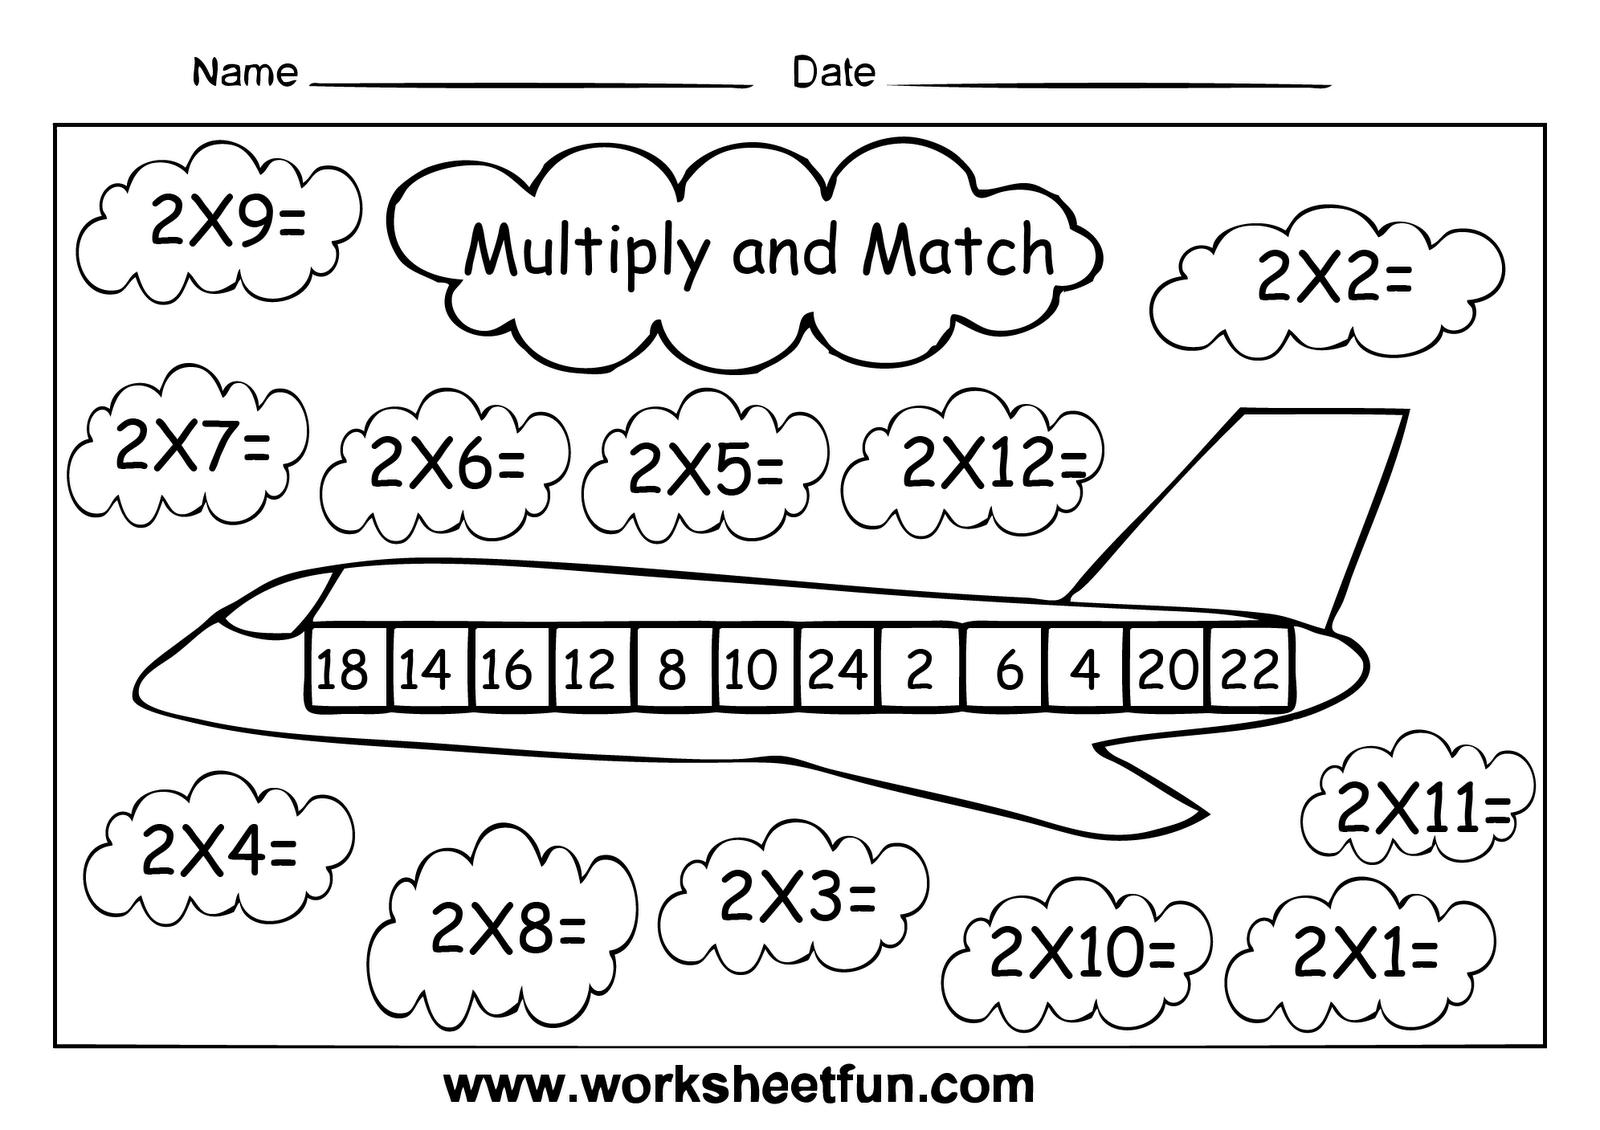 Multiplication Worksheets Of 2 Digits